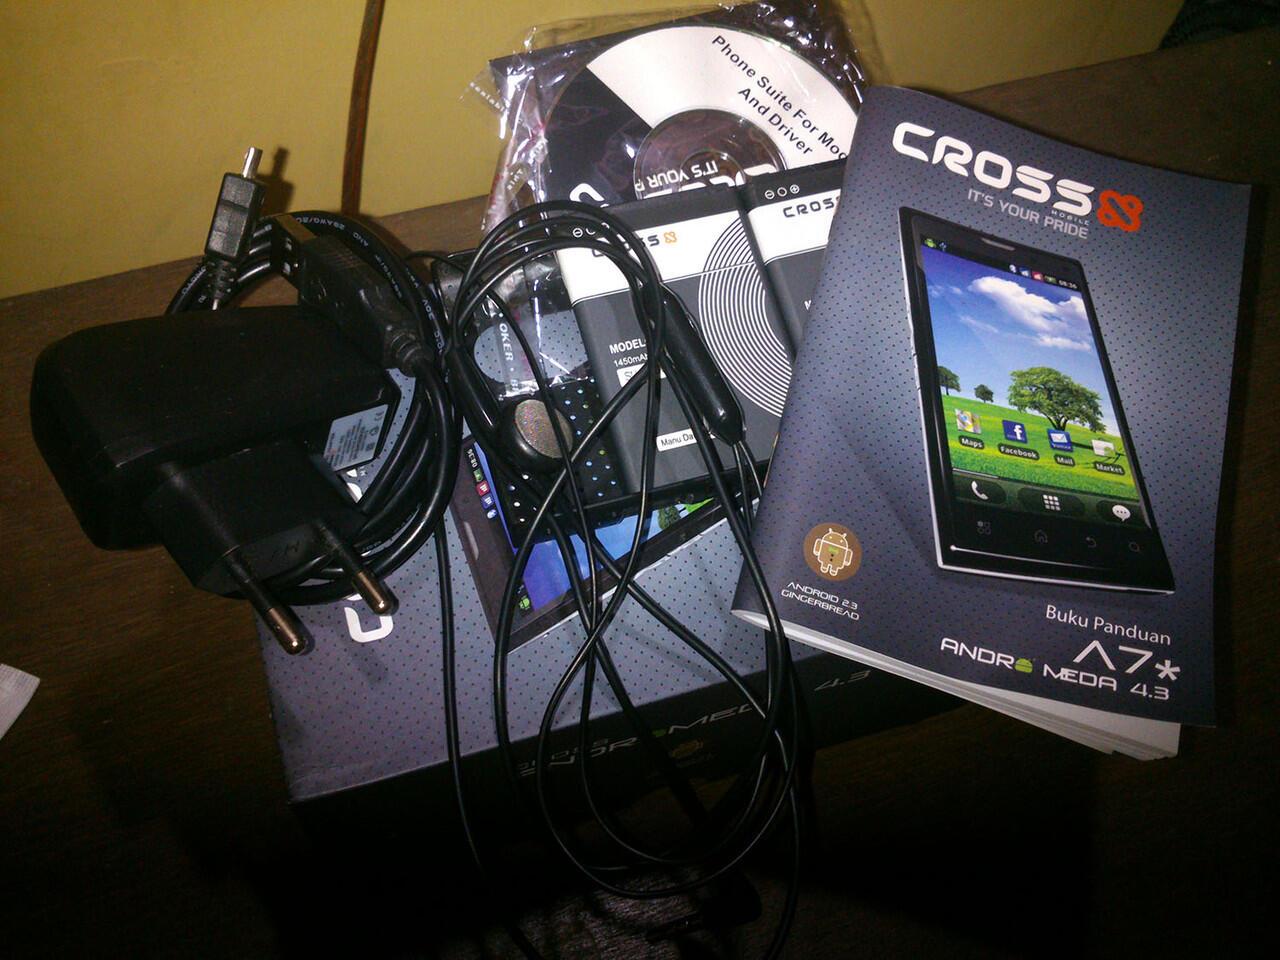 Cross A7* Fullset masih Garansi